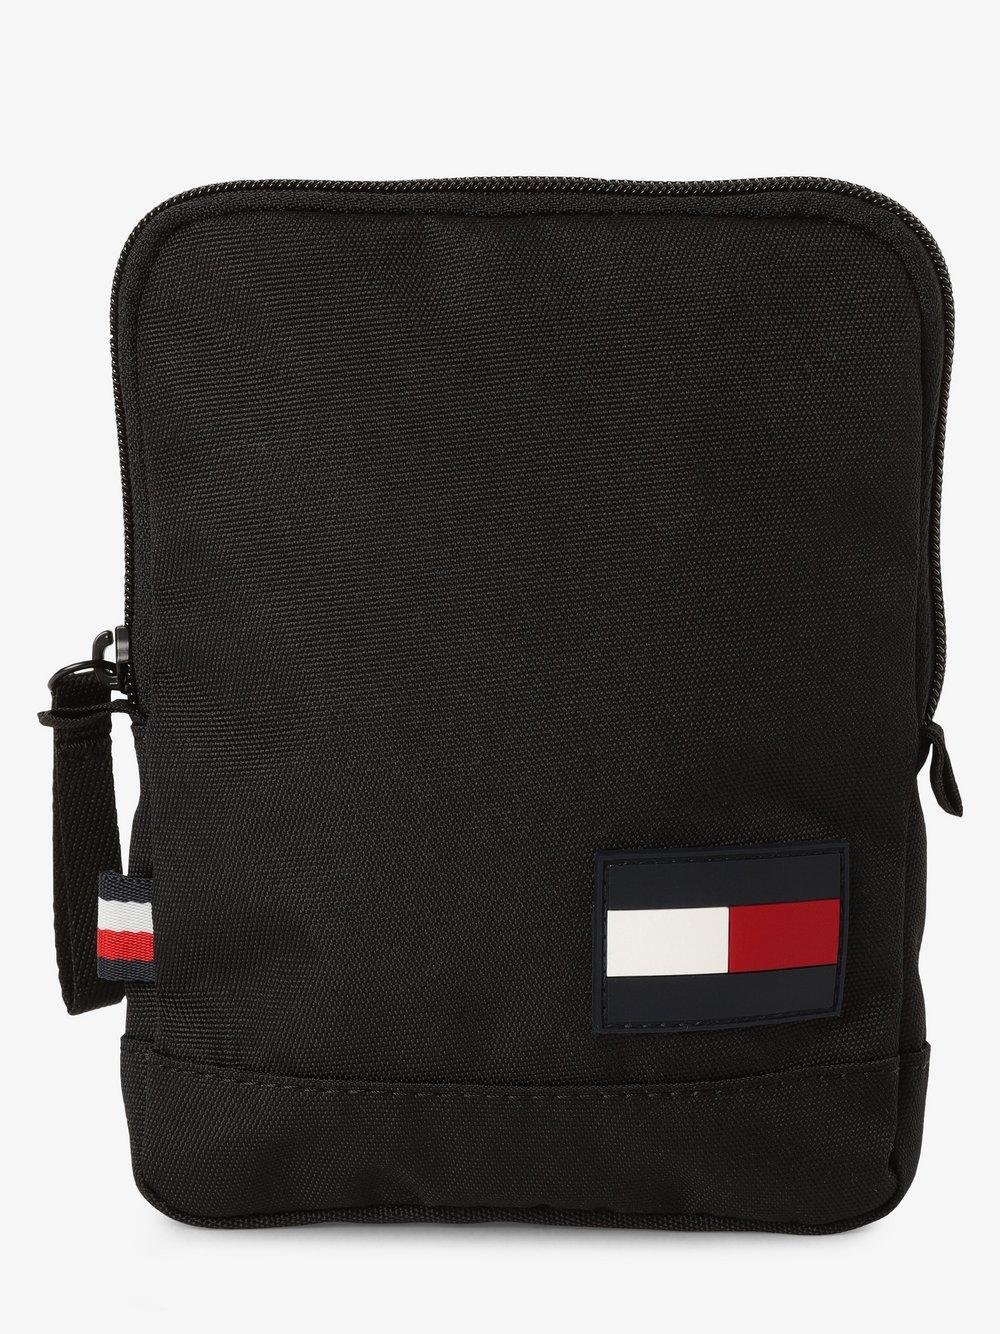 Tommy Hilfiger - Męska torebka na ramię, czarny